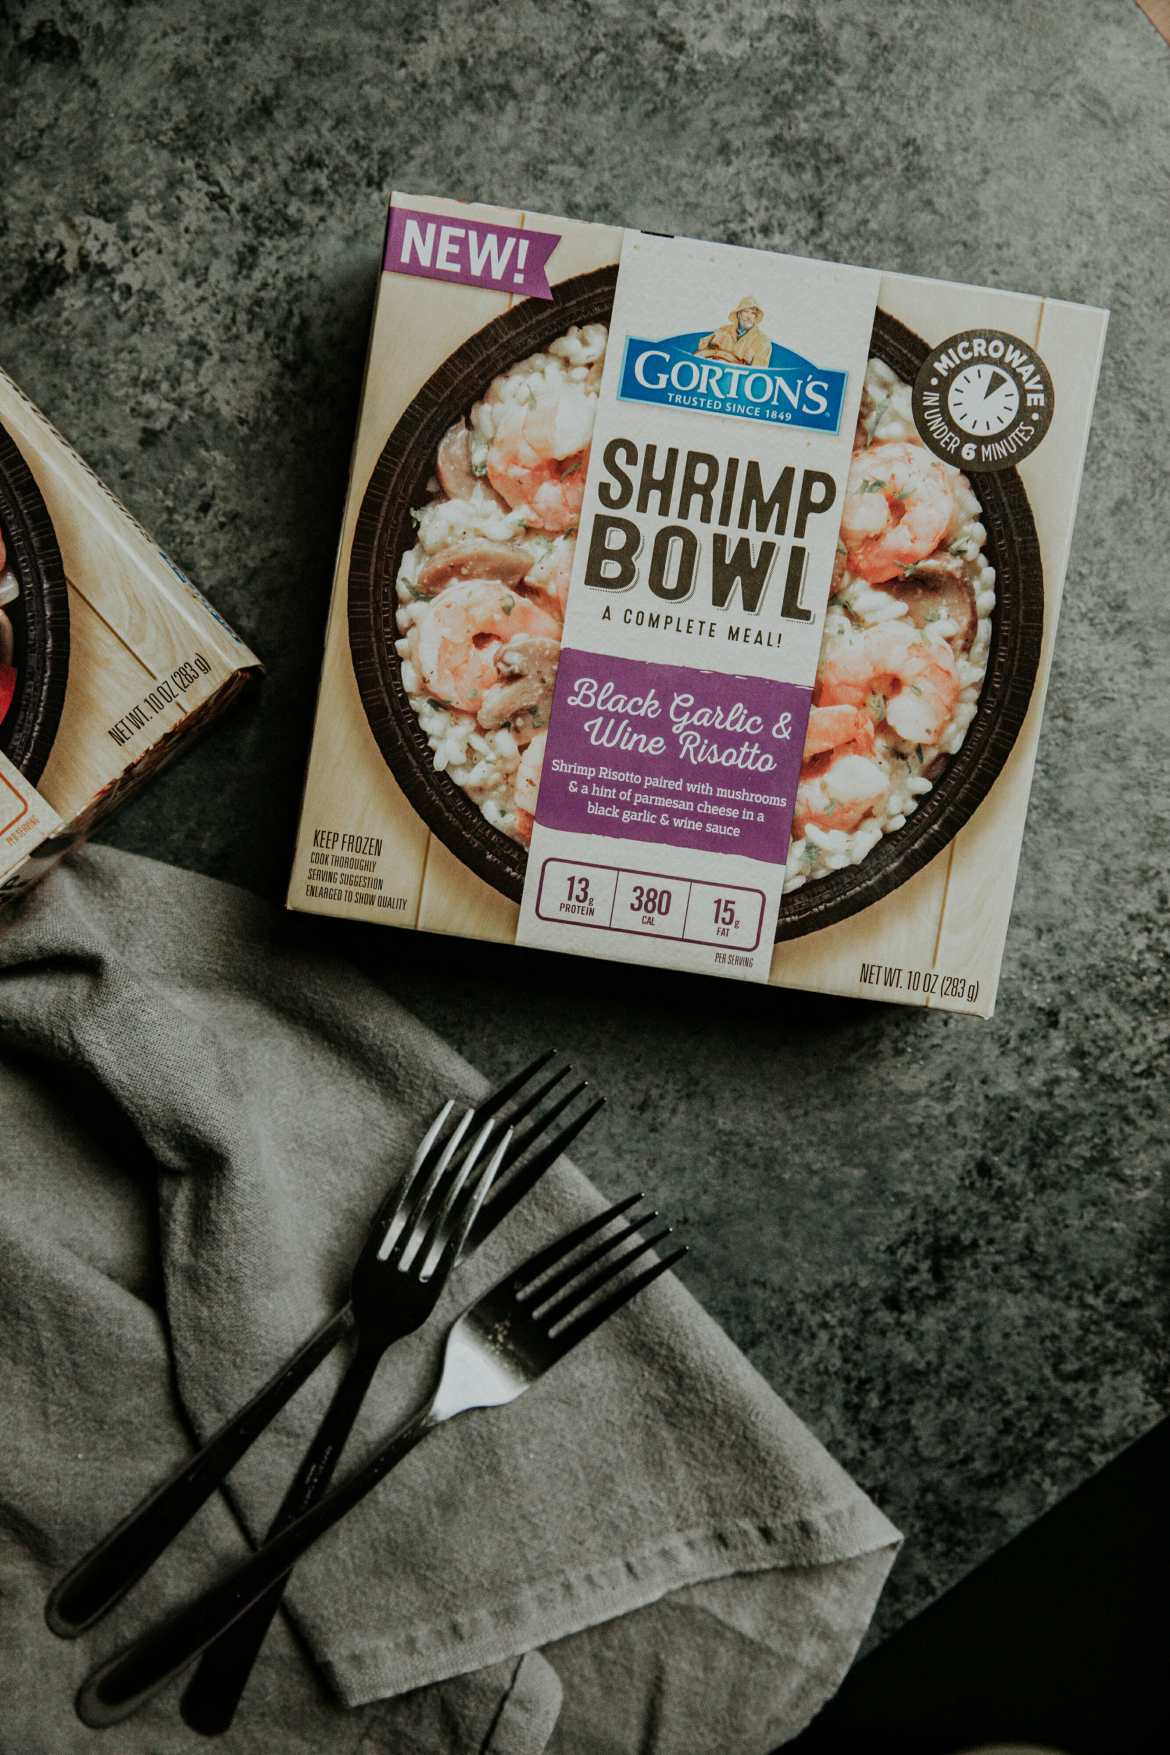 gorton's seafood shrimp bowls